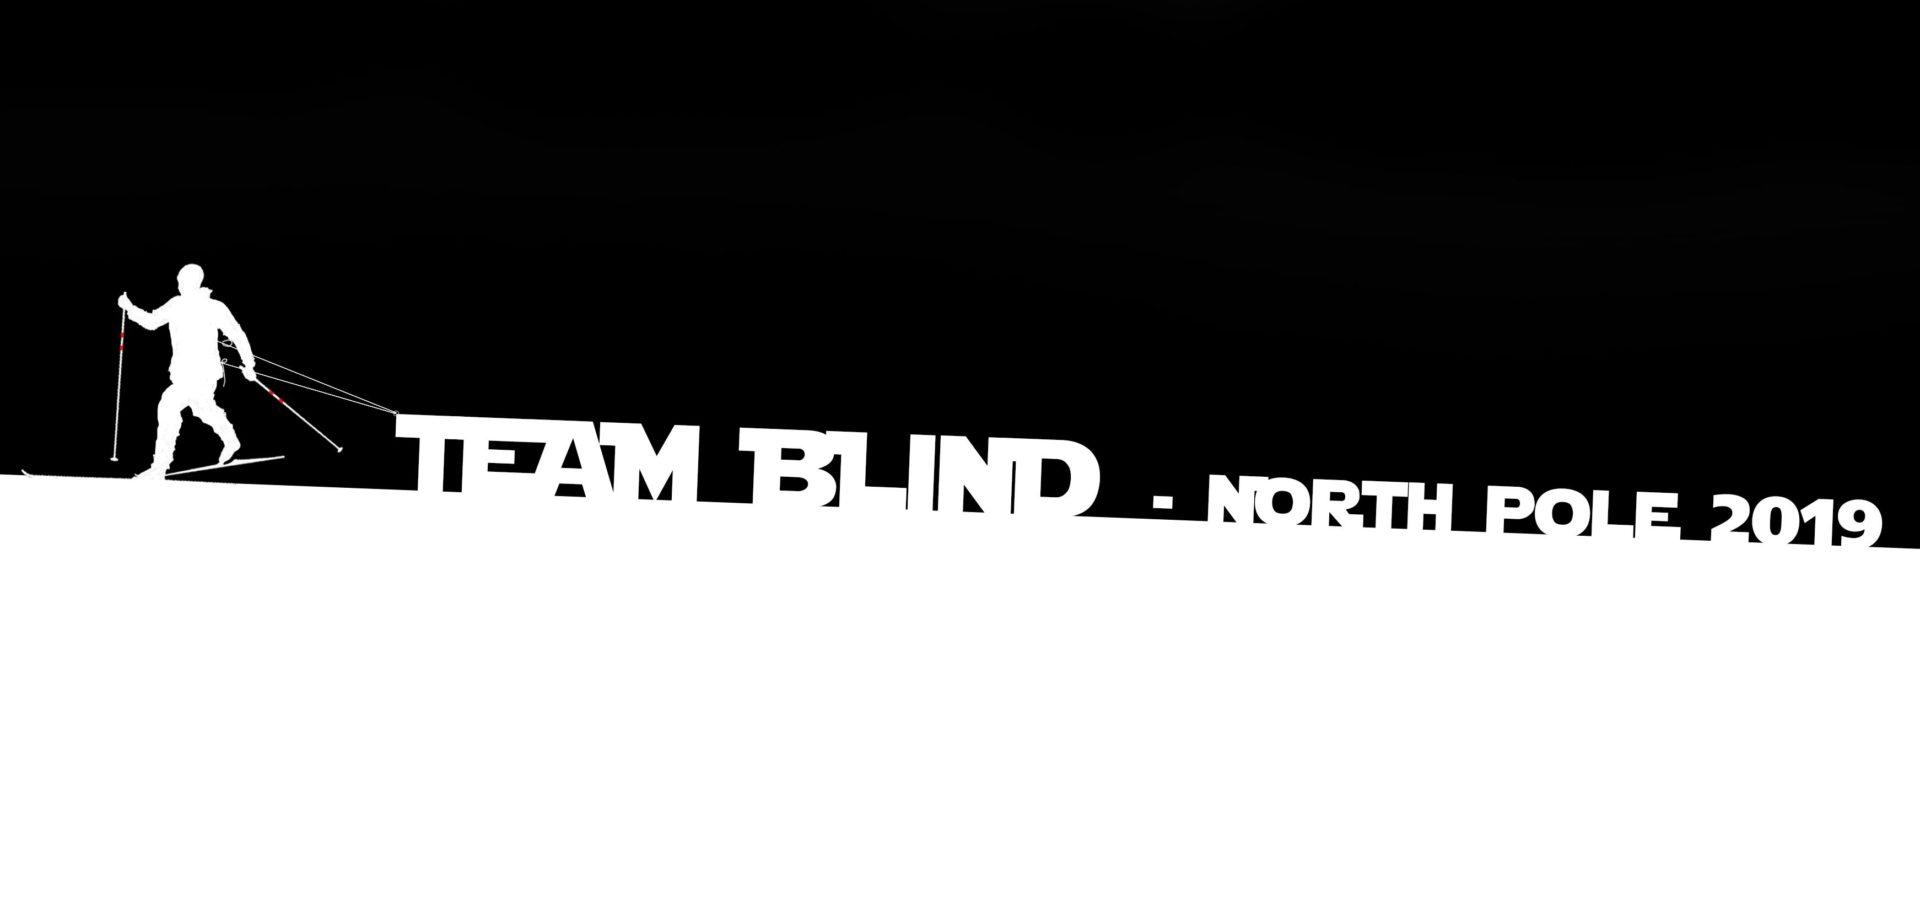 Logo for Team Blind - North Pole 2019